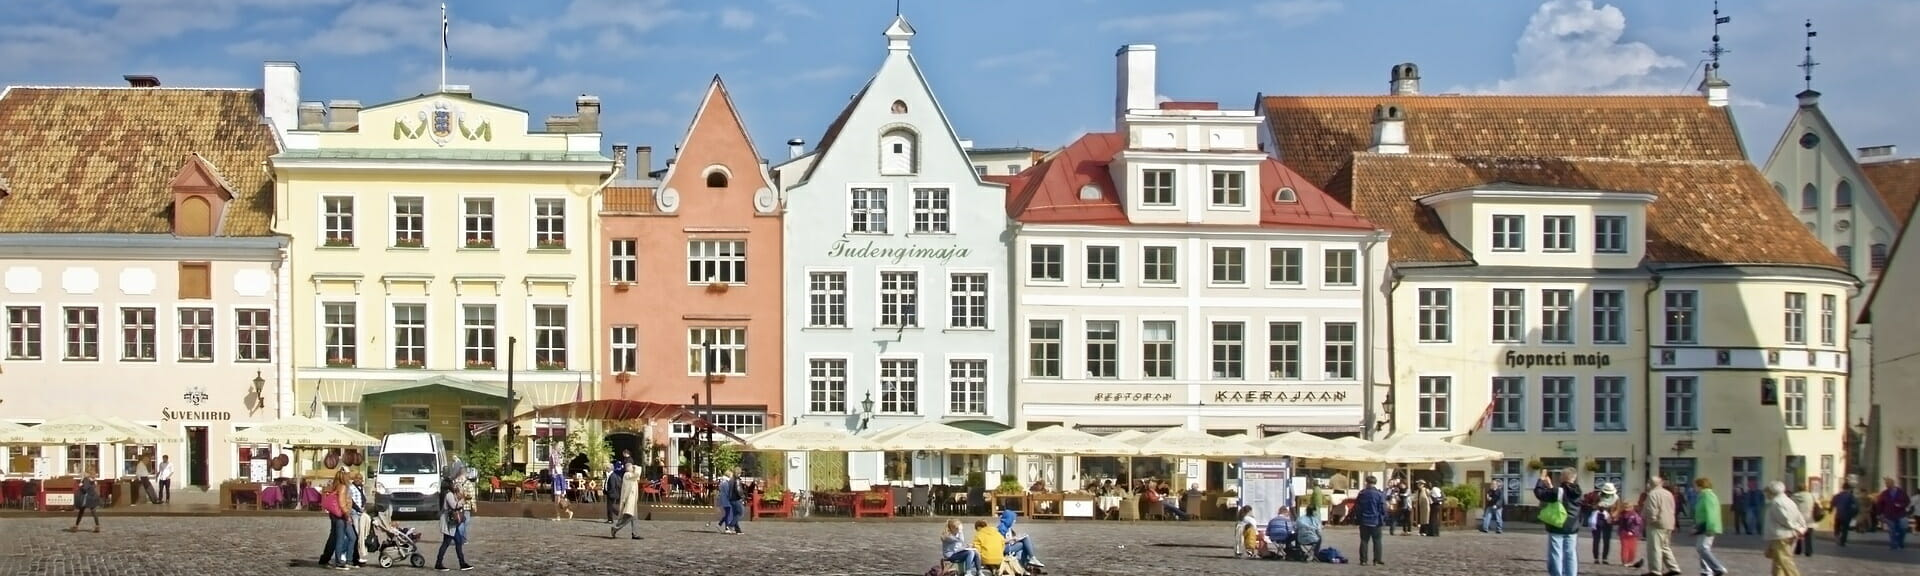 Klassenfahrt Tallinn Platz